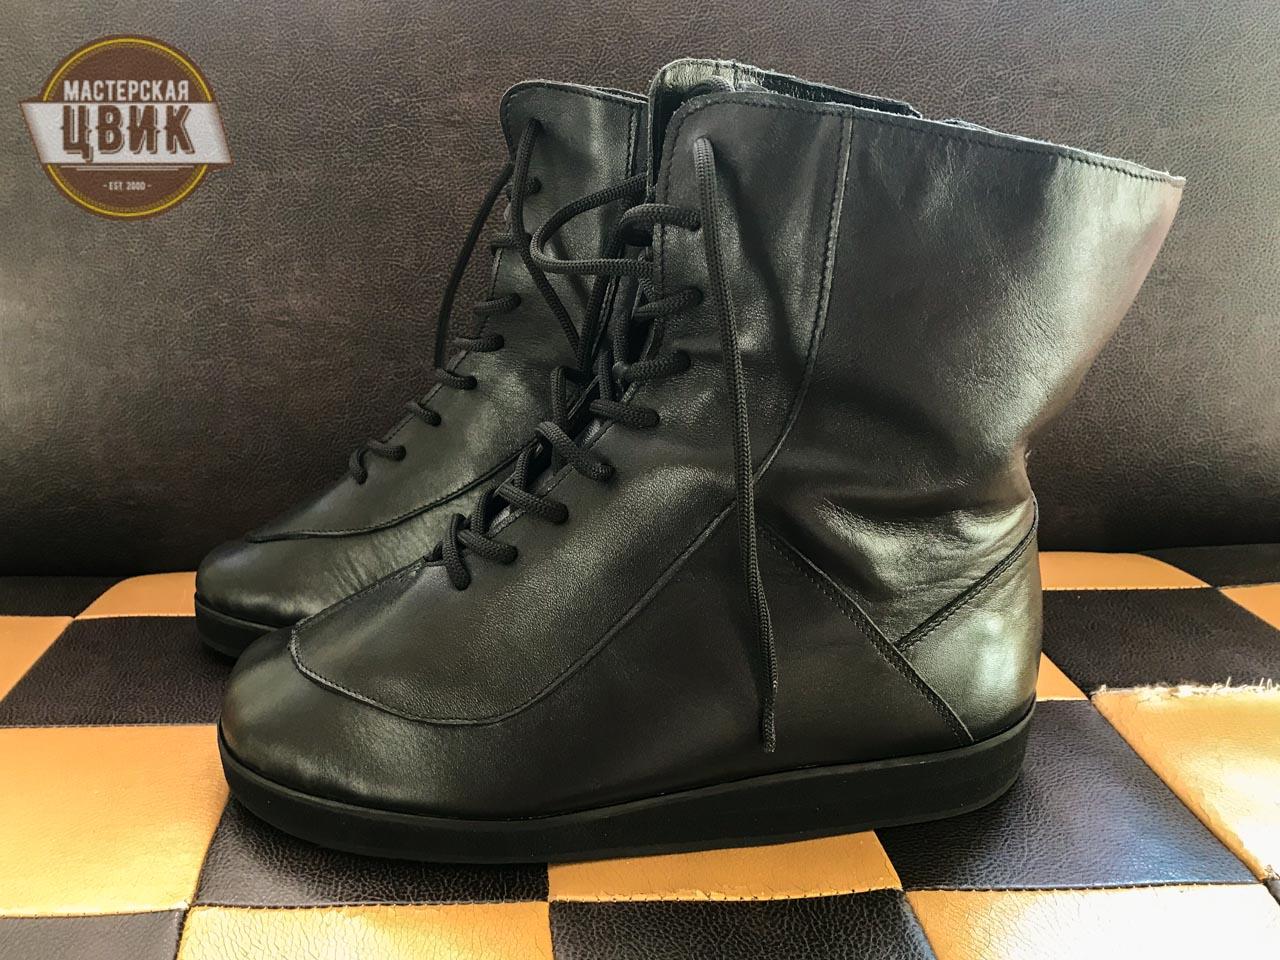 individualnyj-poshiv-obuvi-minsk-1 Индивидуальный пошив обуви Минск-1